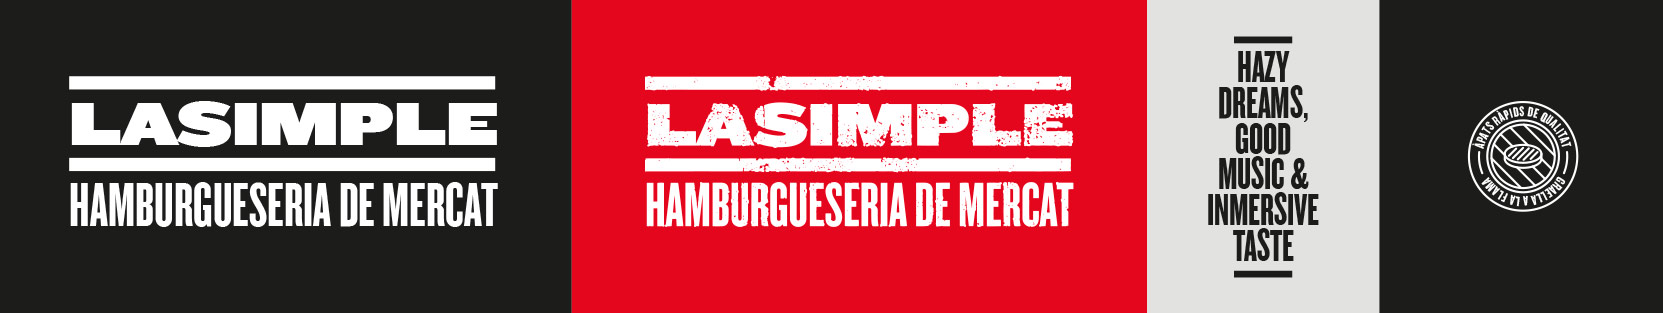 disseny-hamburgueseria-barcelona-05